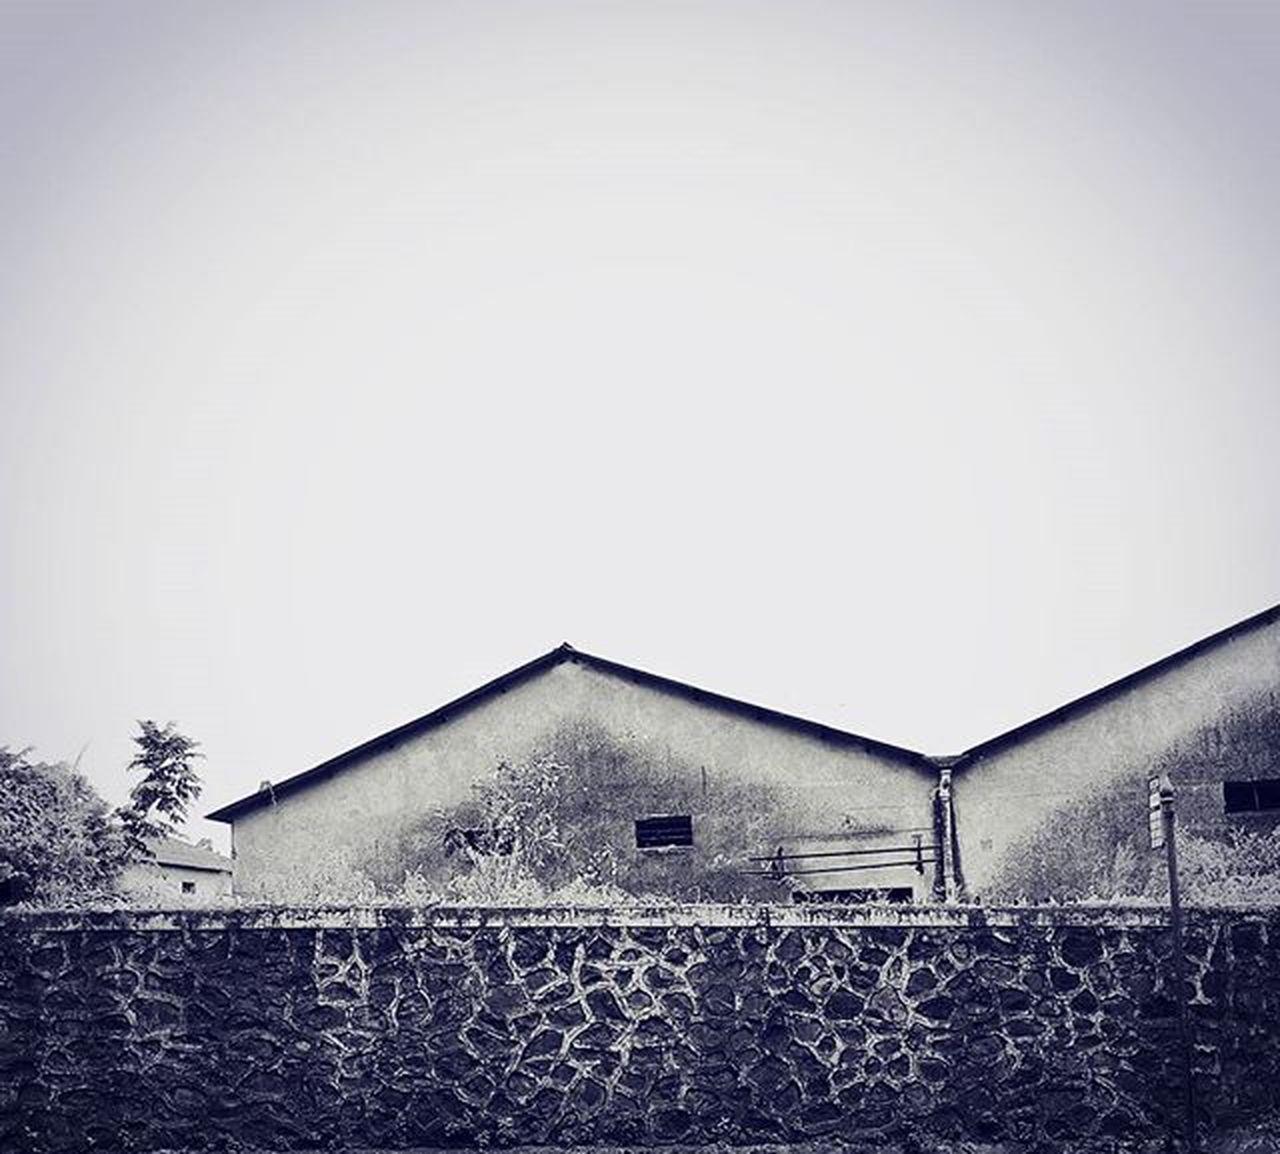 The haunted factory... Abandoned Haunted Factory Wall Seewhatotherscantsee Repostingindia Indianstories India_gram Ig_maharashtra Ig_india Ig_worldclub Indian_photographers Asusglobal Zenfone Zenfoneglobal Instadaily Instagood Instagram Asus _soi